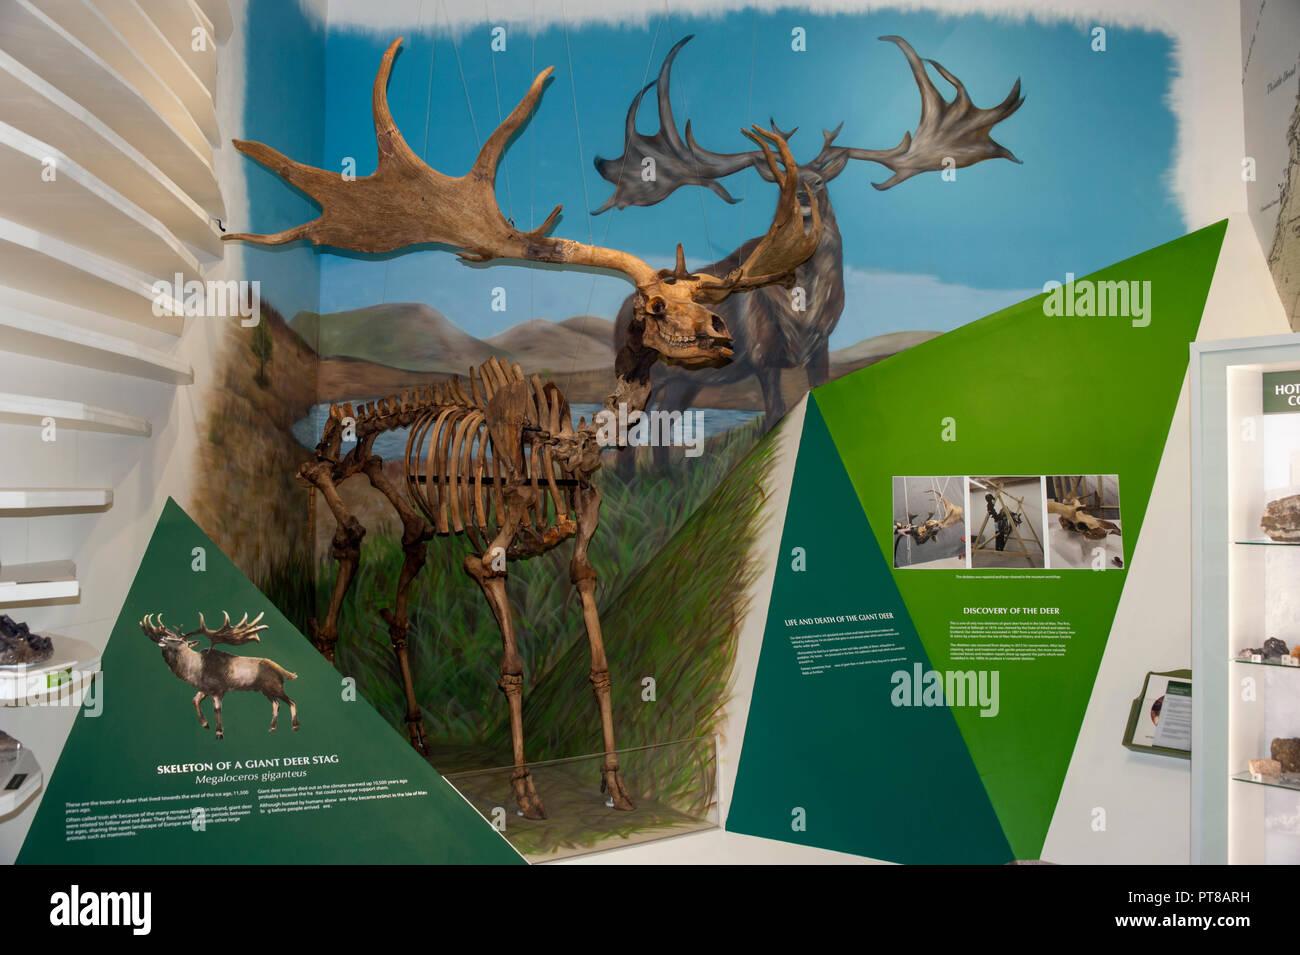 Great Deer Skeleton Exhibit, Manx Museum, Douglas, Isle of Man - Stock Image